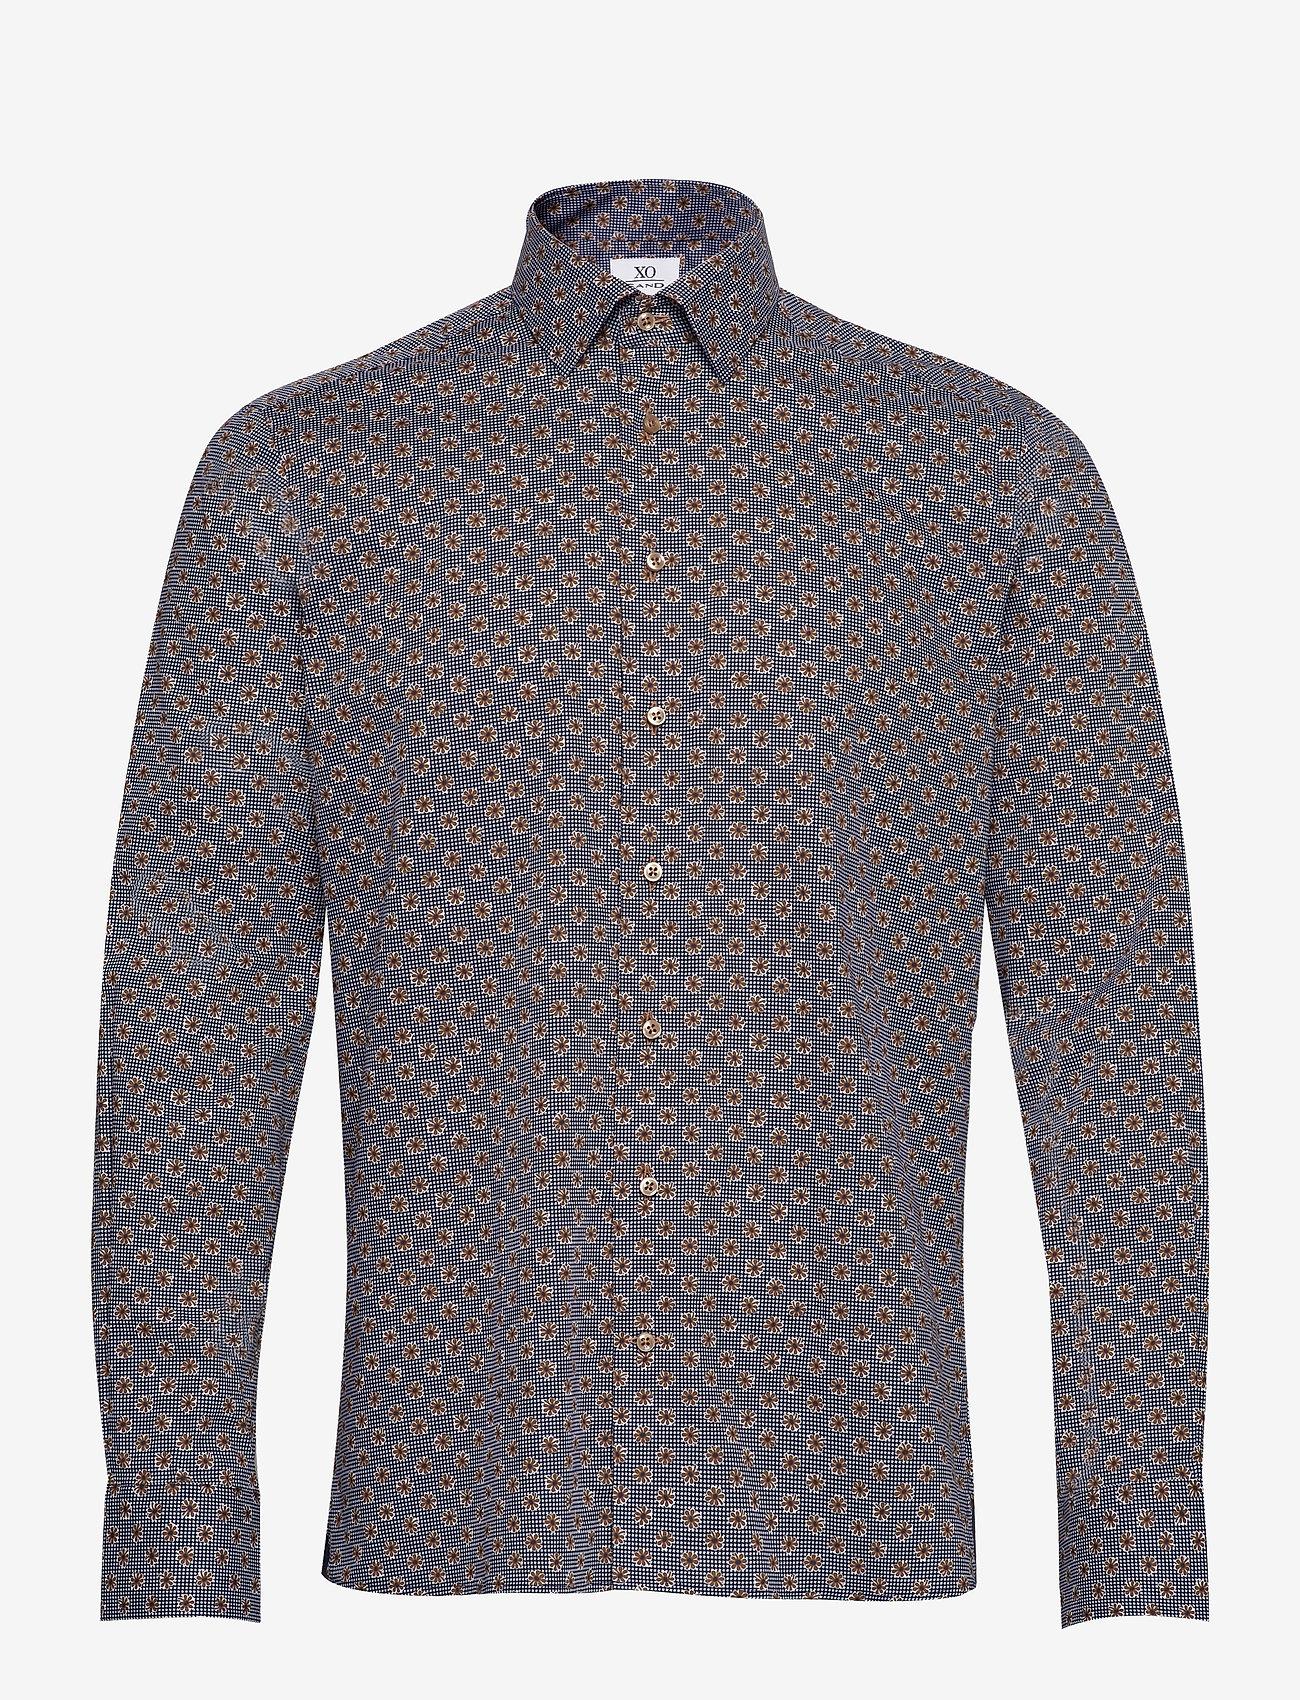 XO Shirtmaker by Sand Copenhagen - 8667 - Gordon SC - business skjortor - dark camel - 0